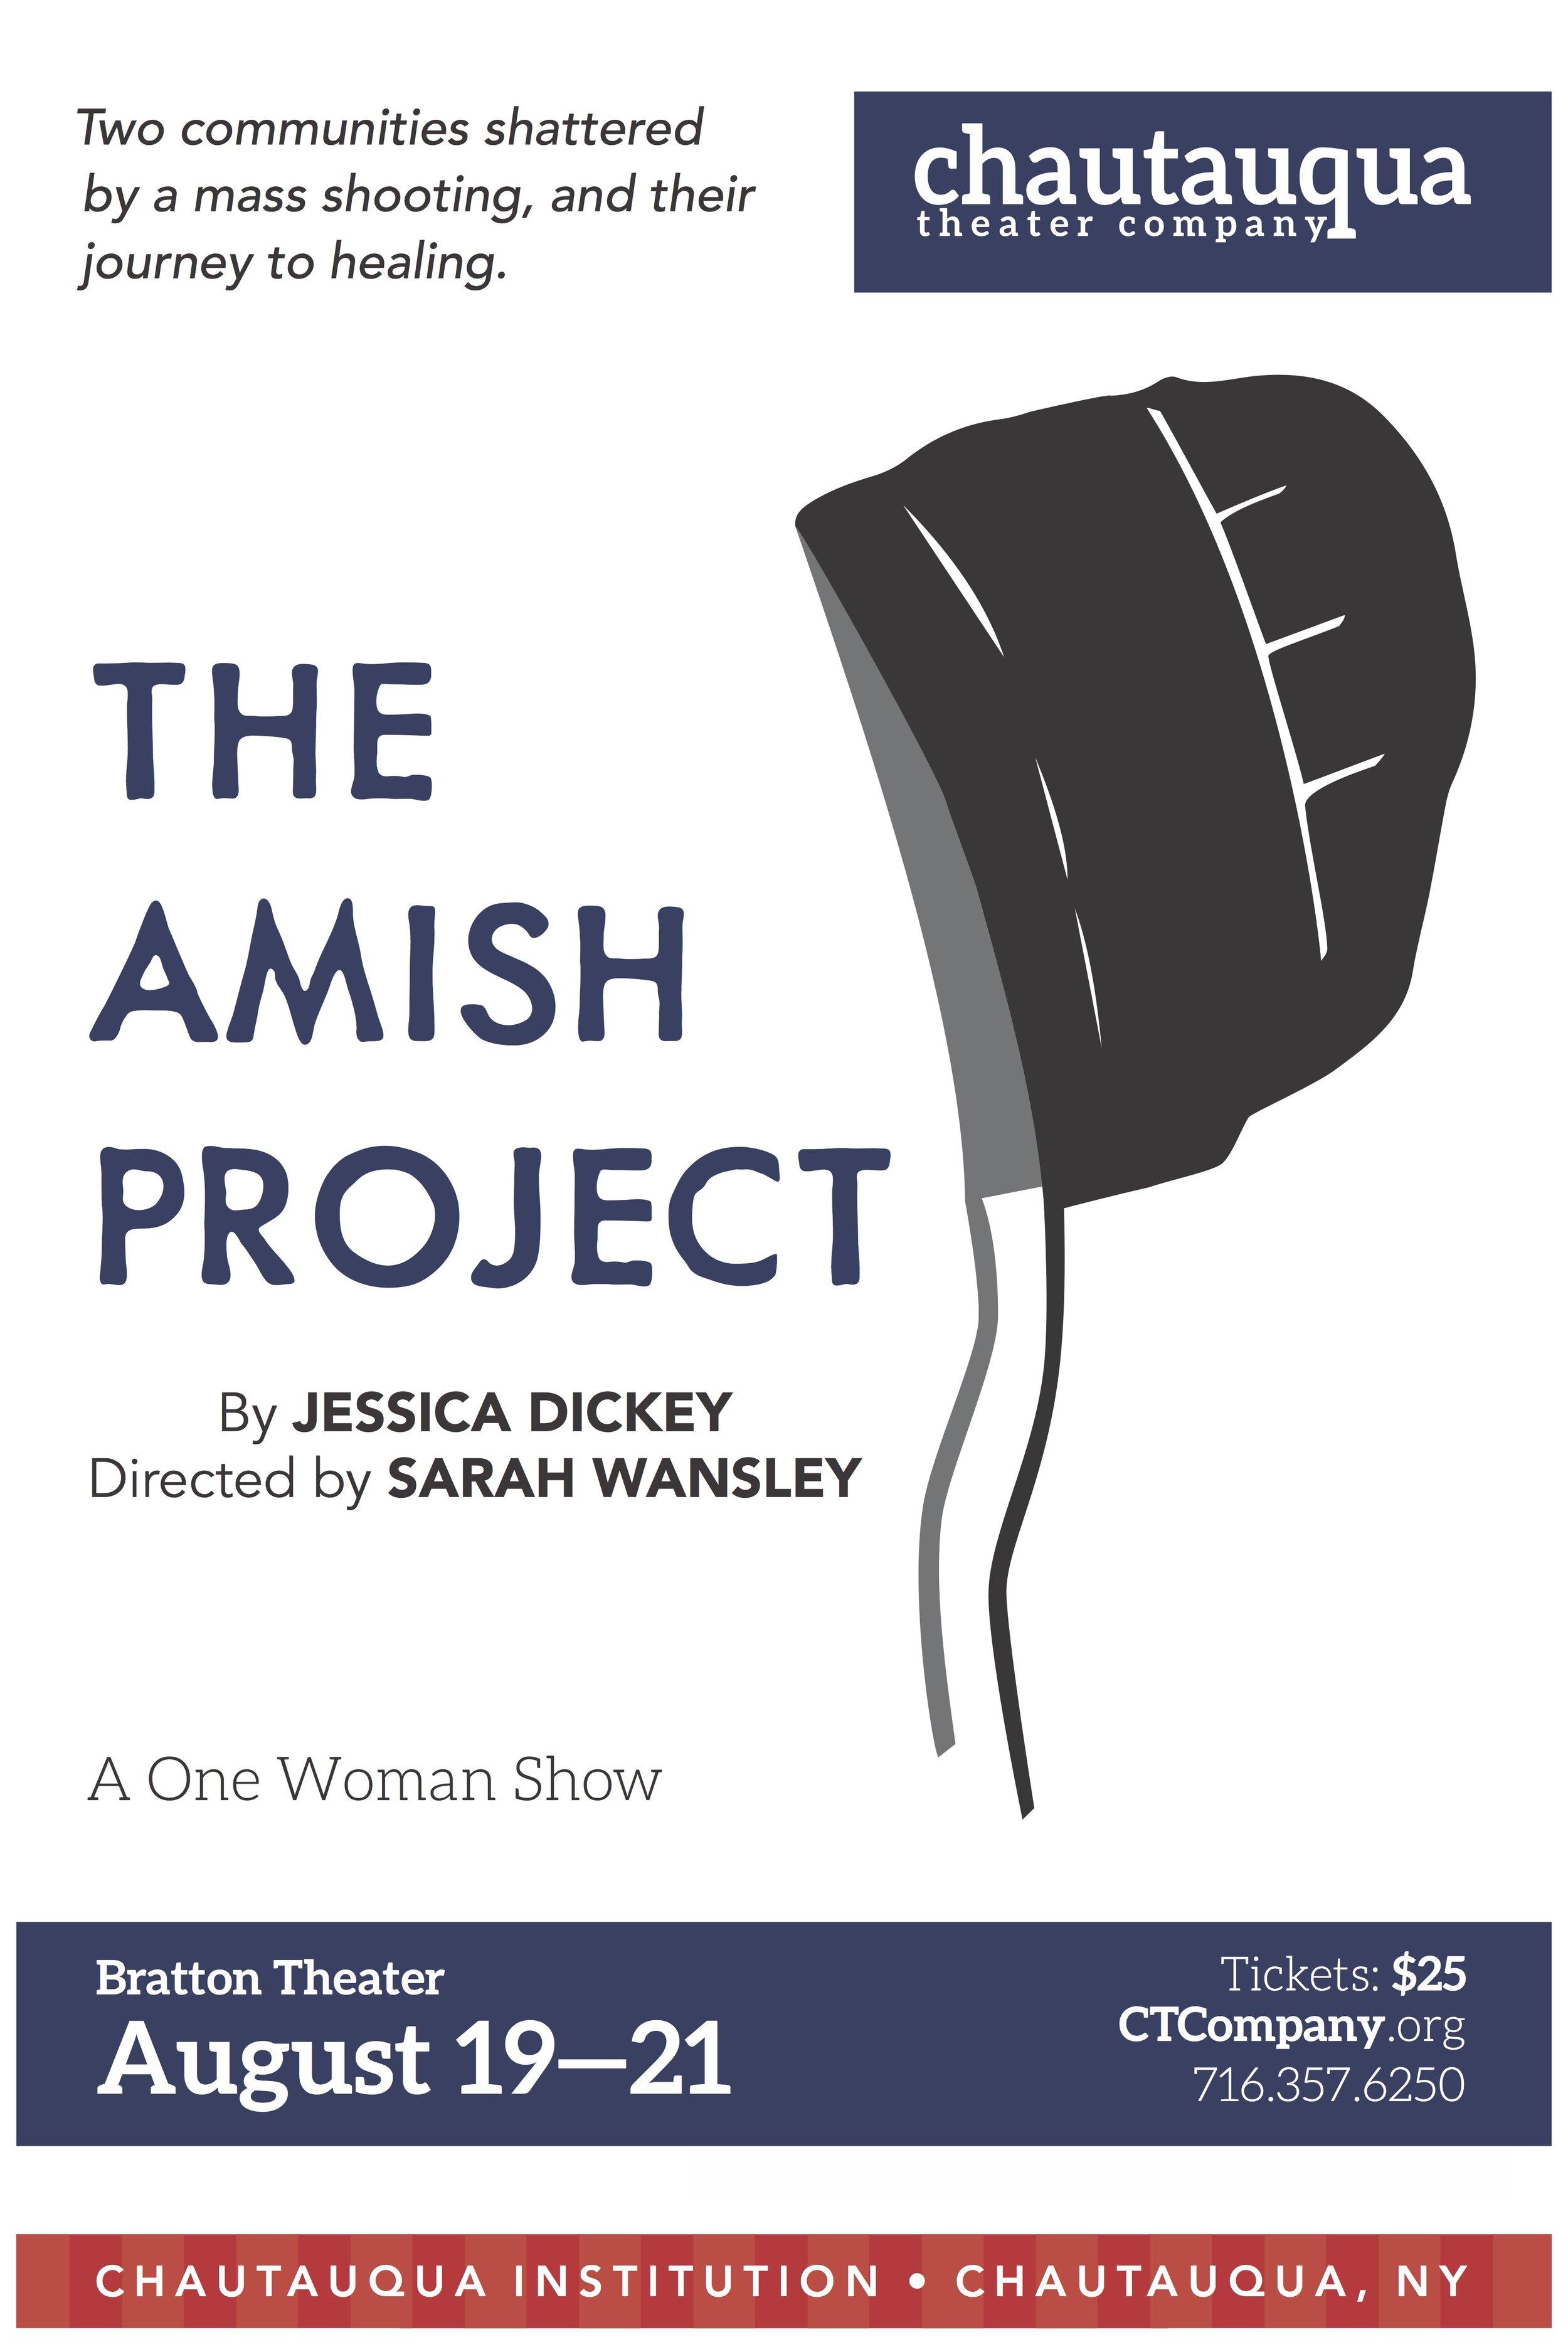 CTC-AmishProject_24x36_final.jpg